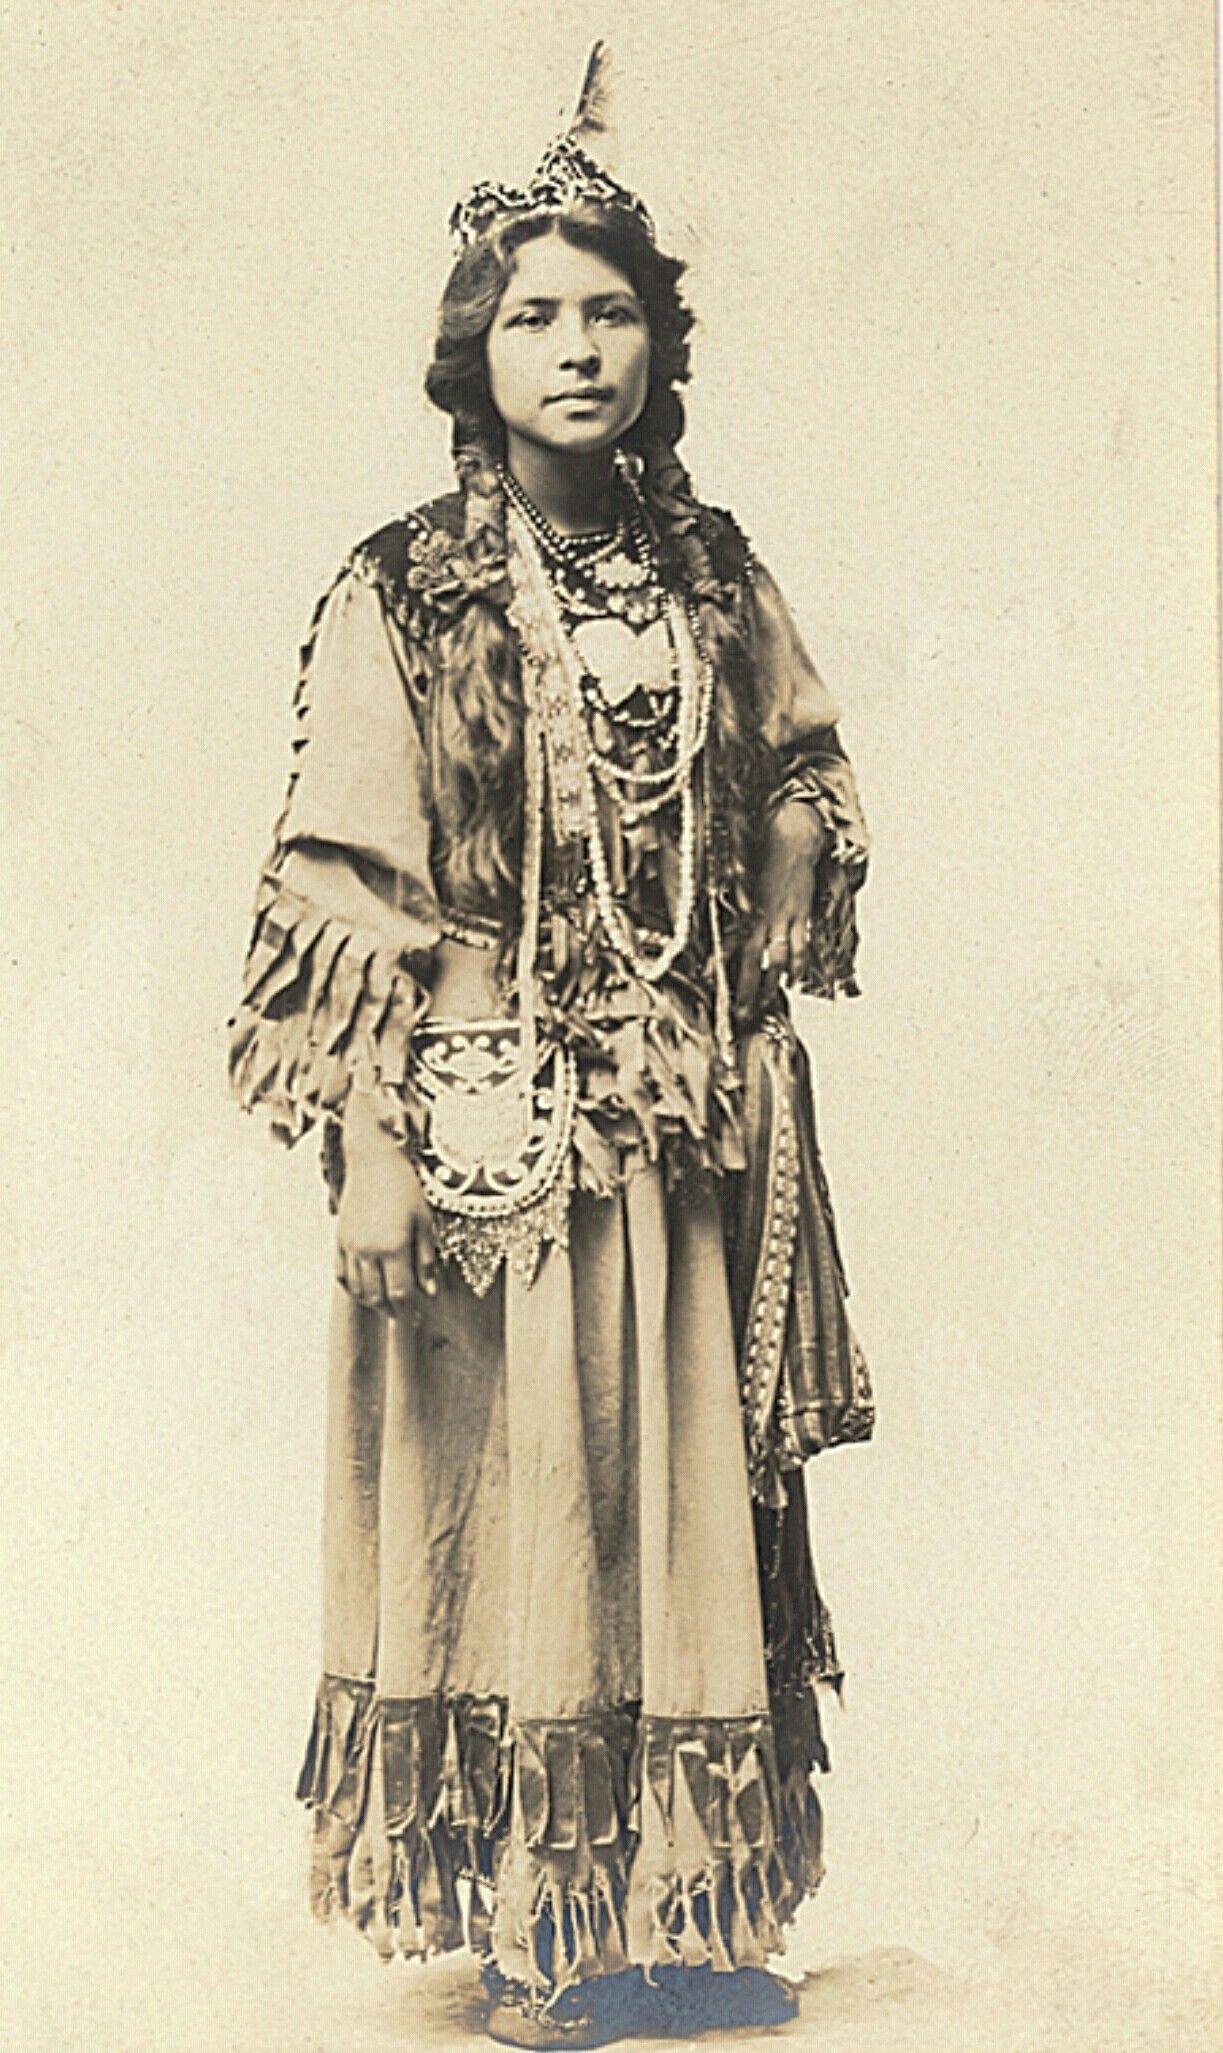 Iroquois Woman